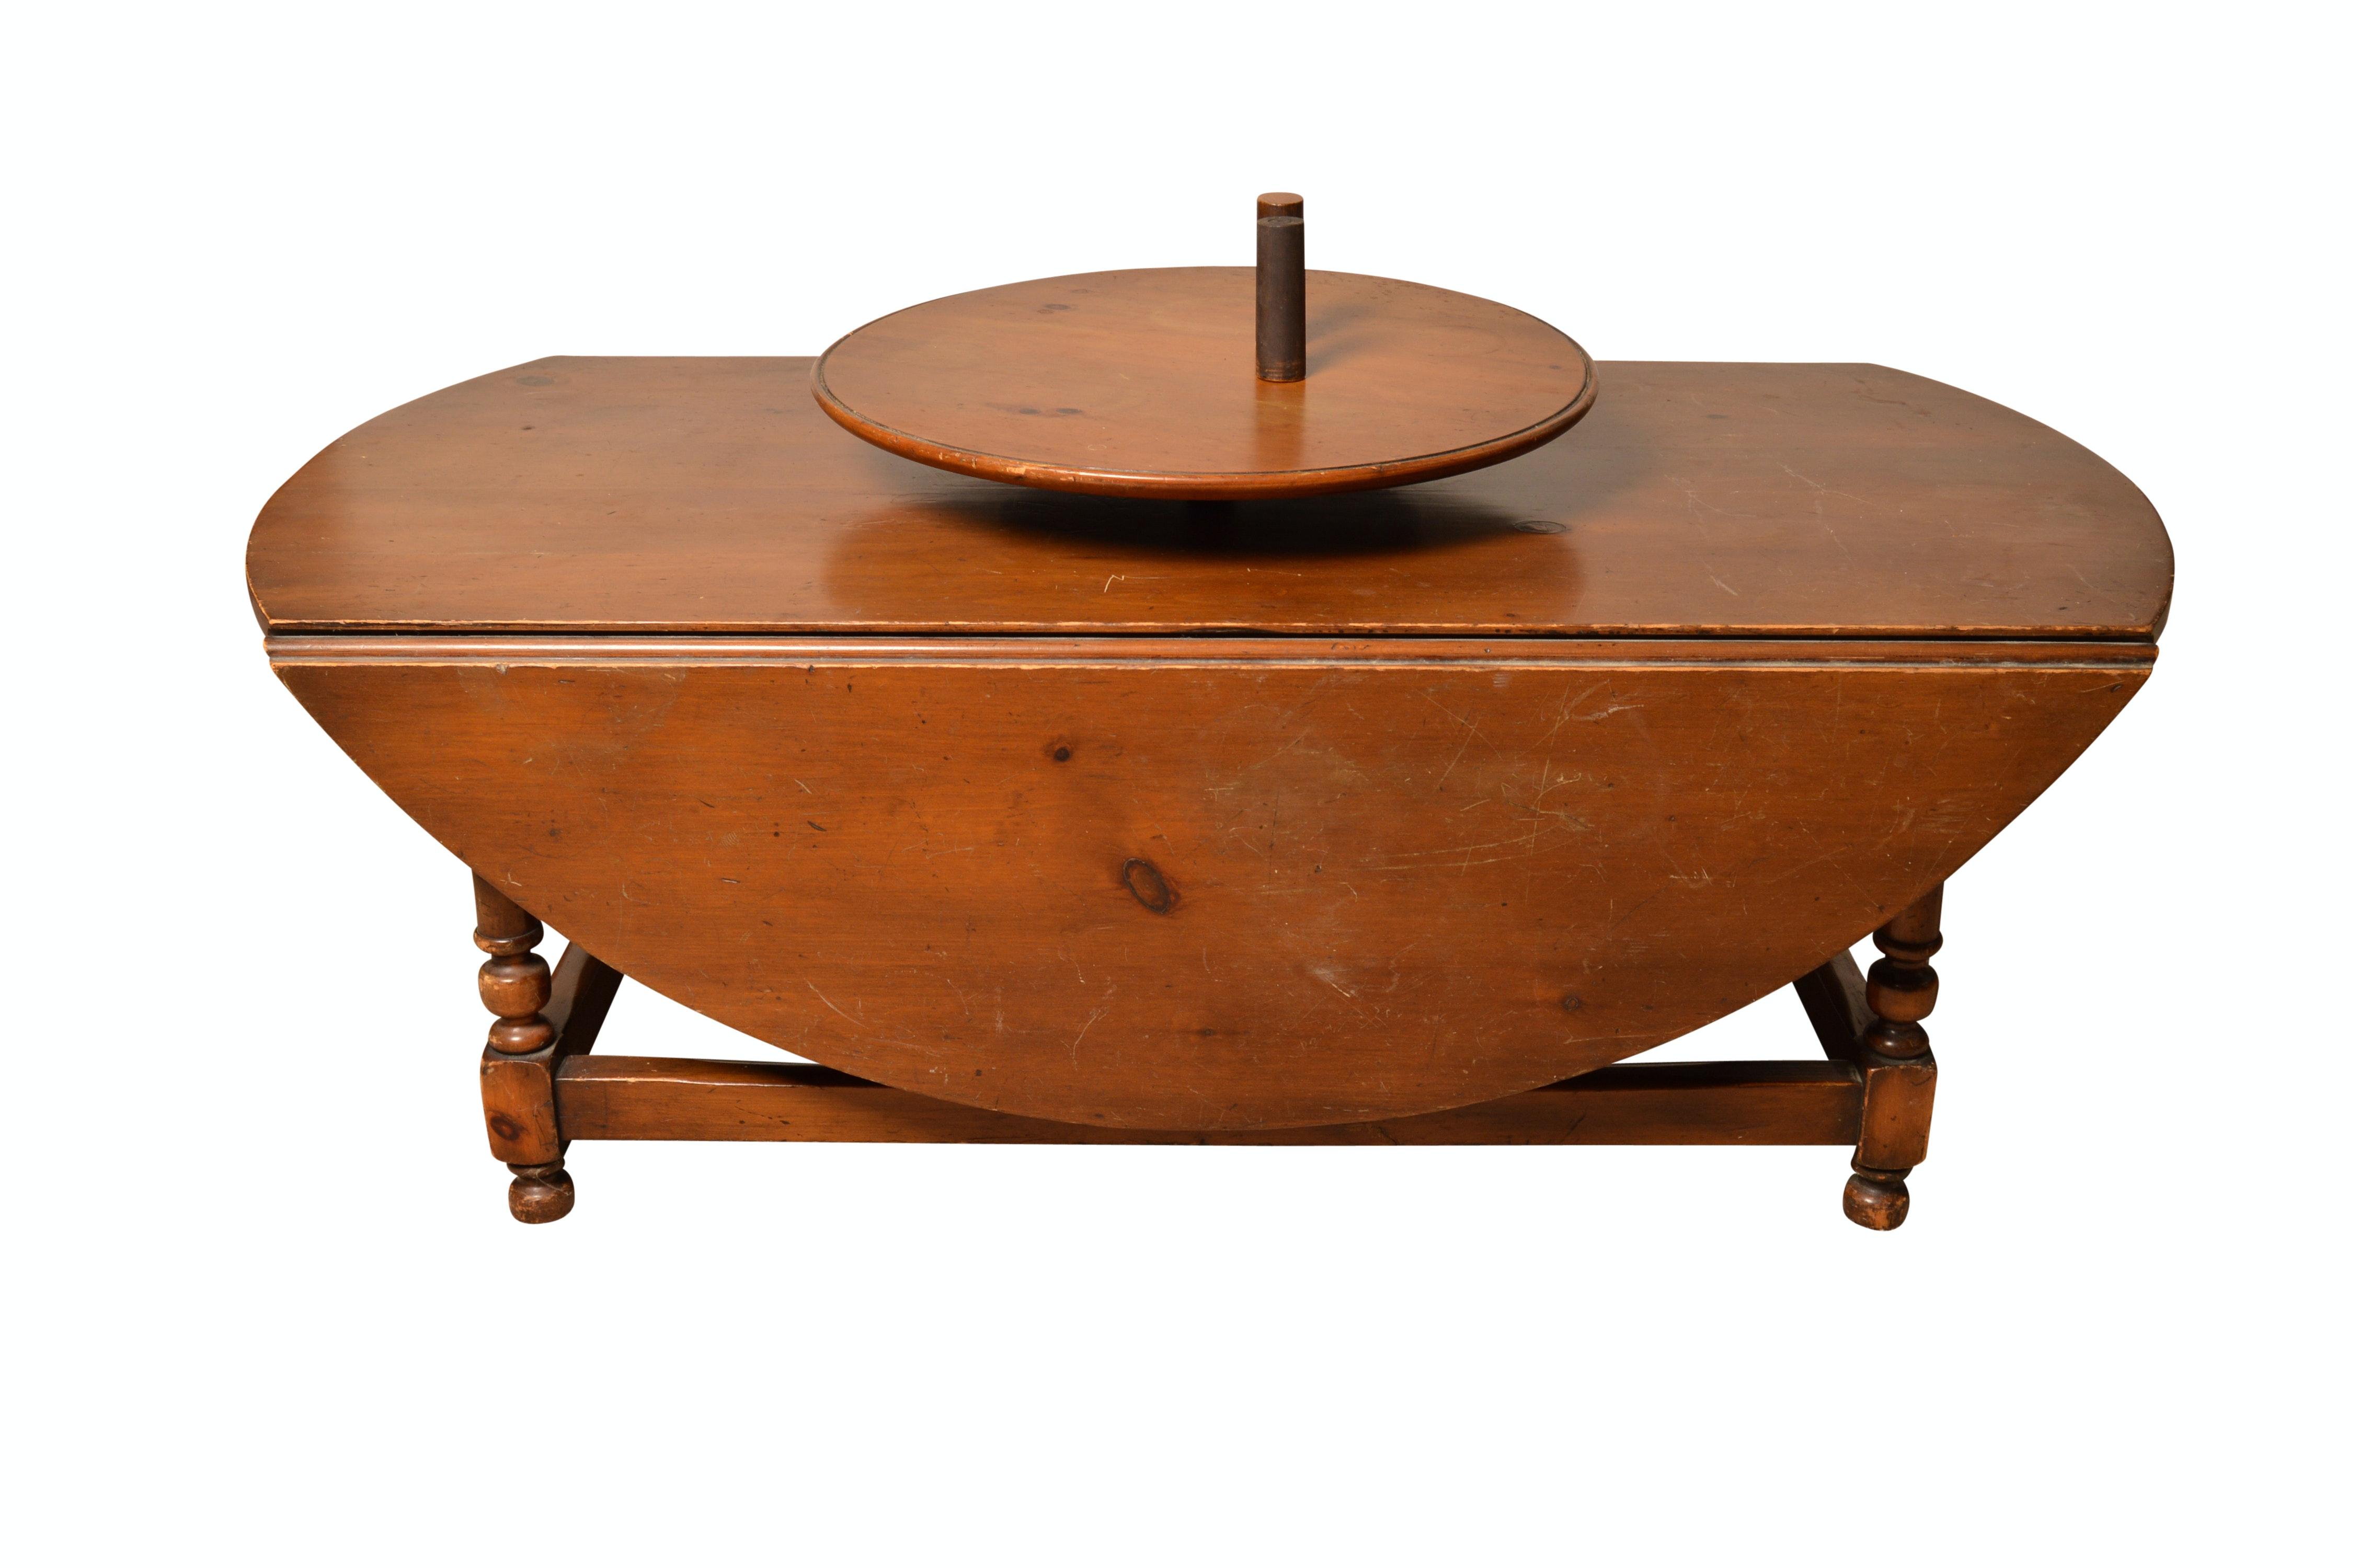 Vintage Pine Drop-Leaf Coffee Table with Lazy-Susan